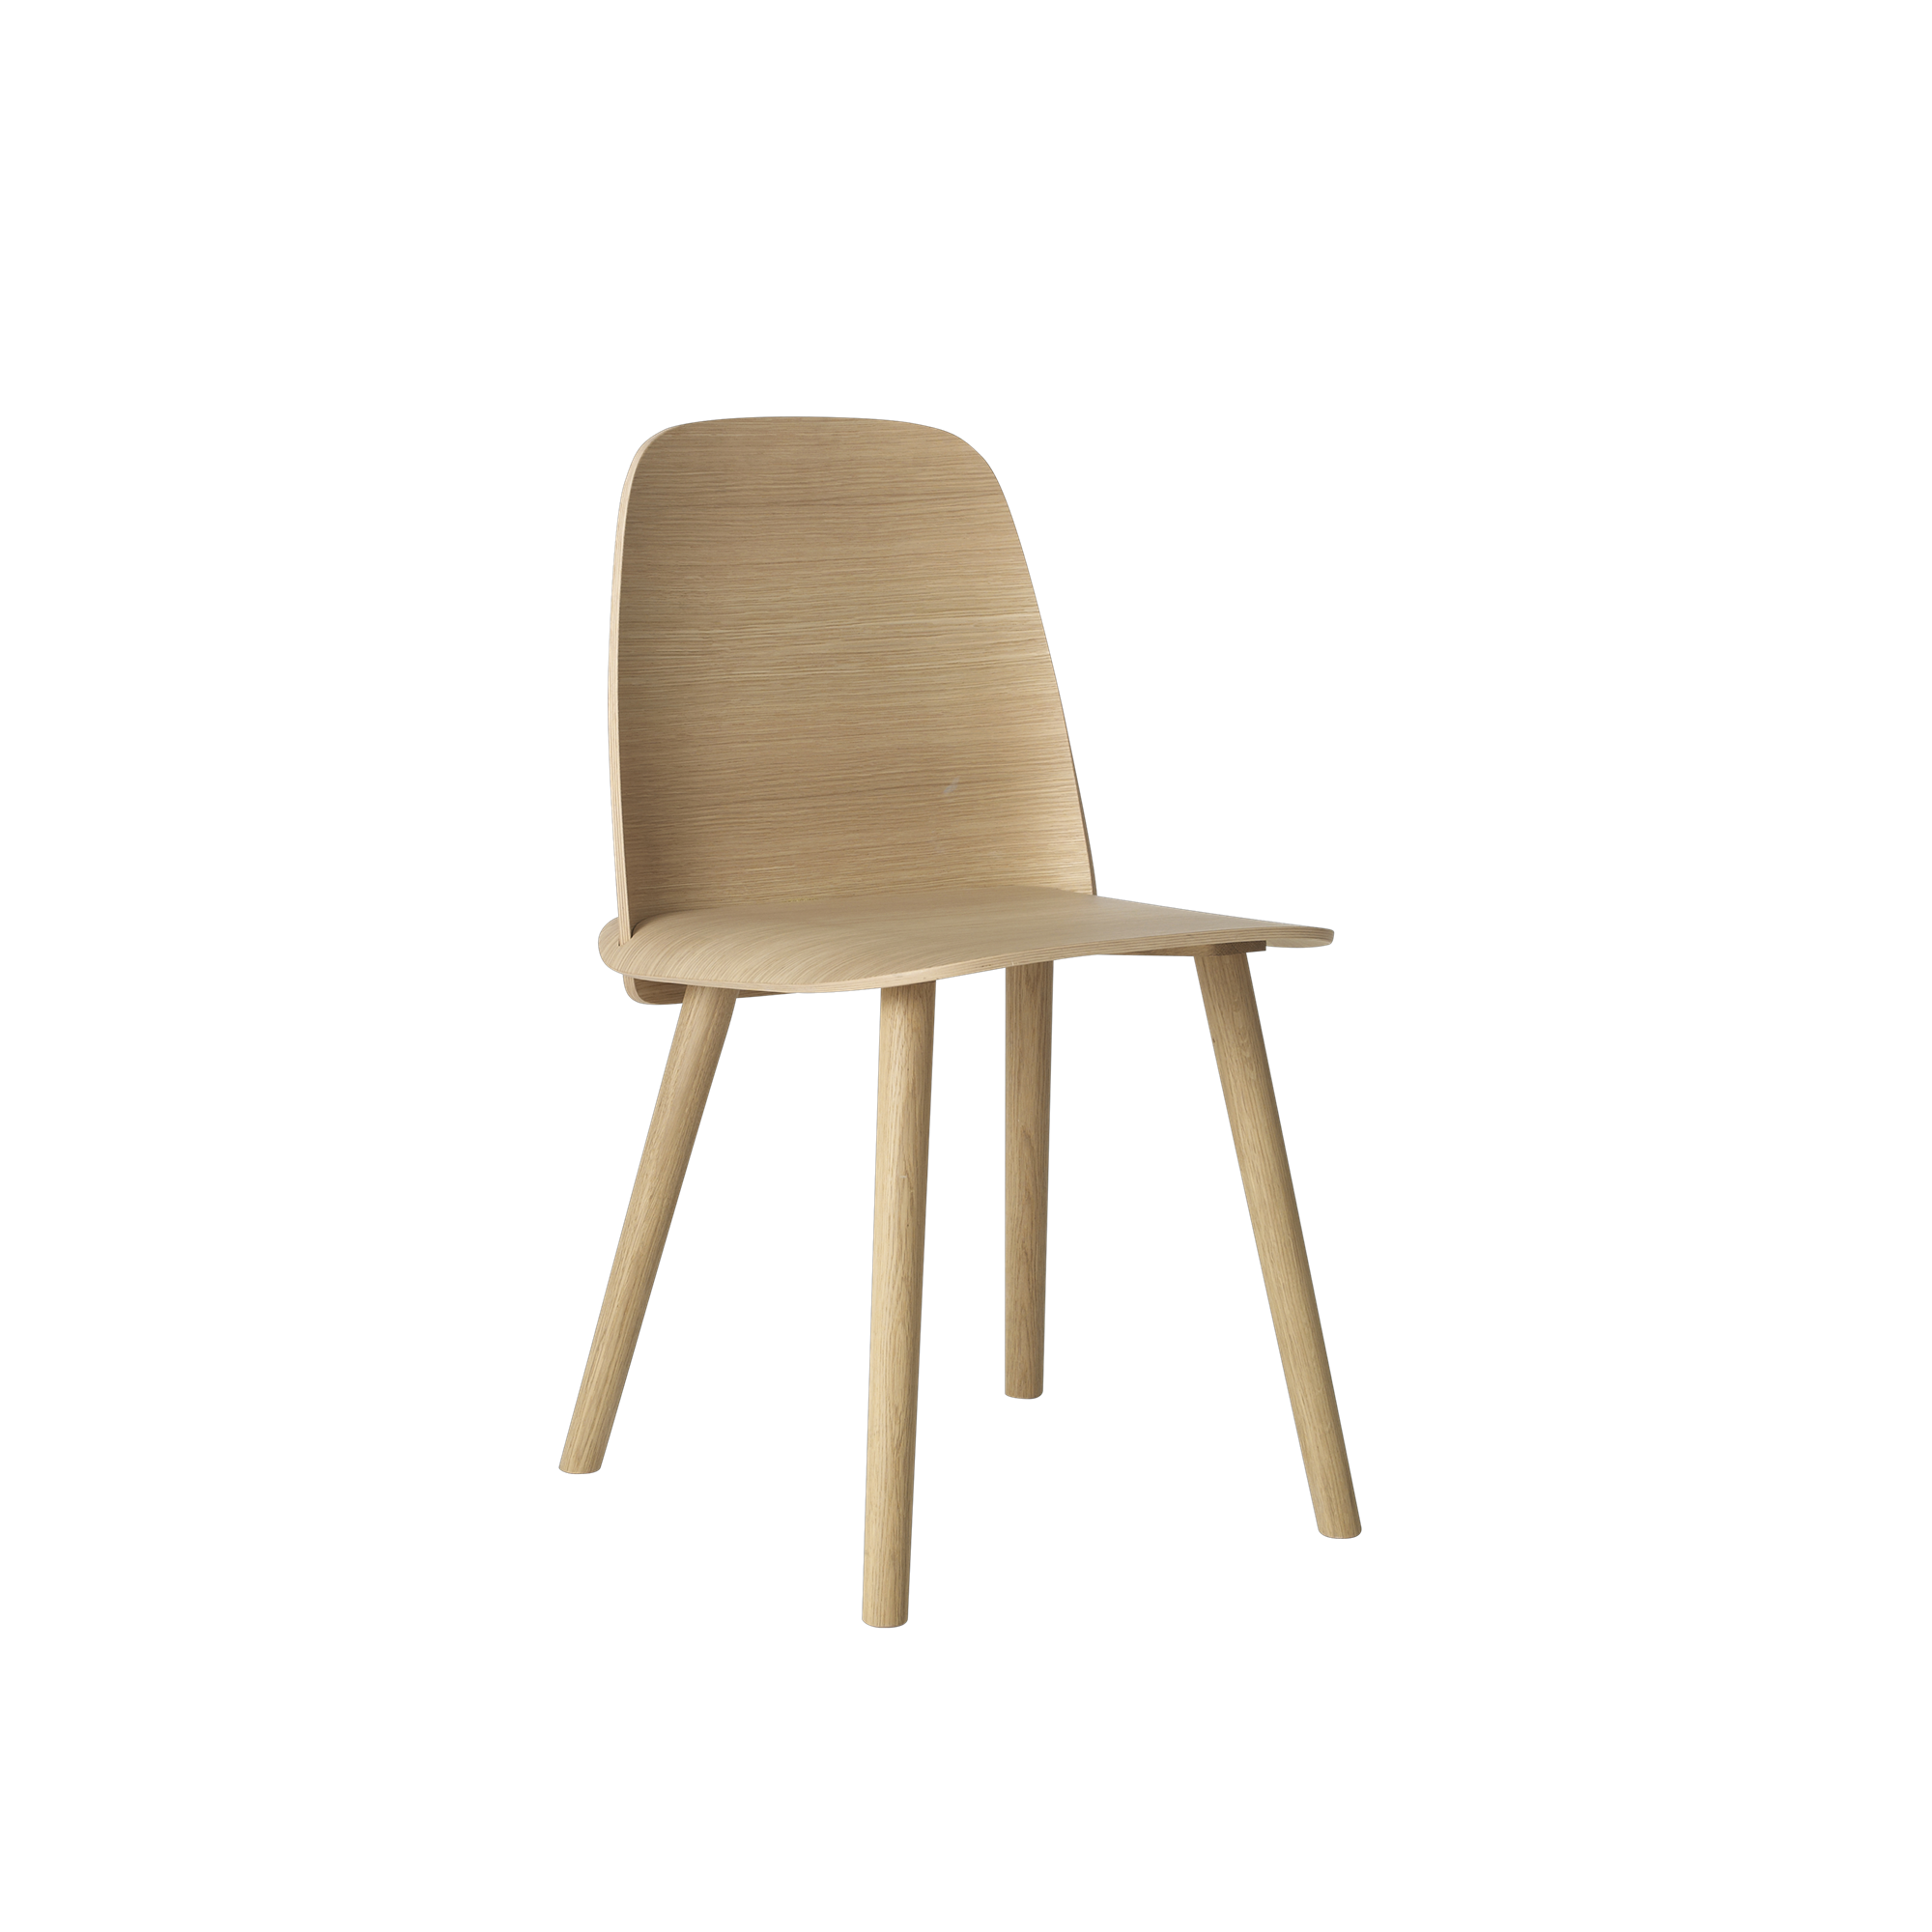 21401-nerd-chair-oak-1503325196-8885600.png